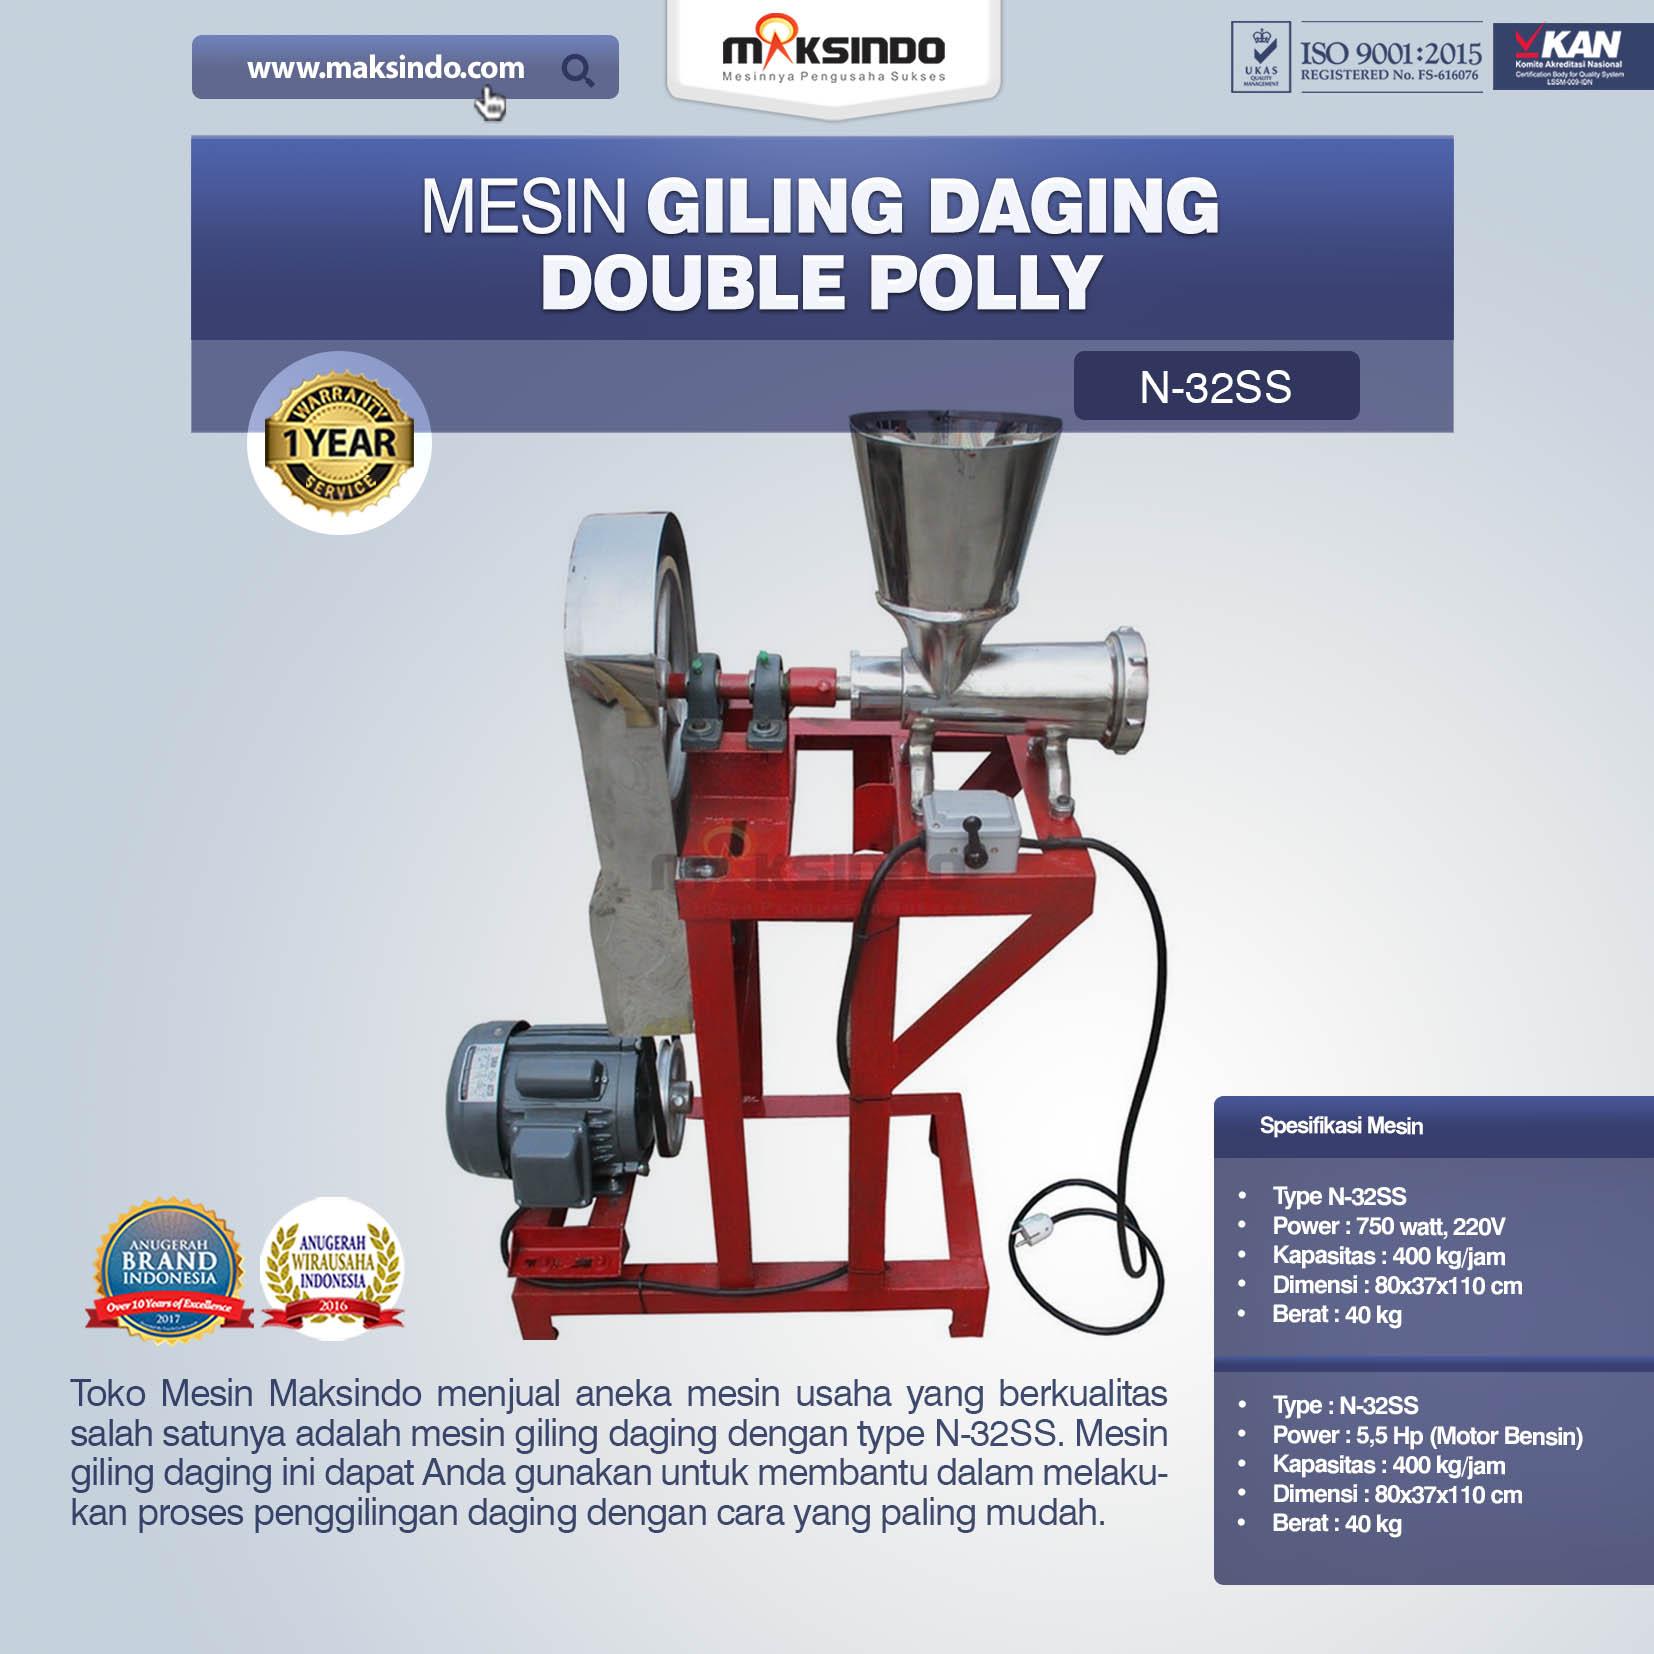 Jual Mesin Giling Daging Double Polly N-32SS di Yogyakarta